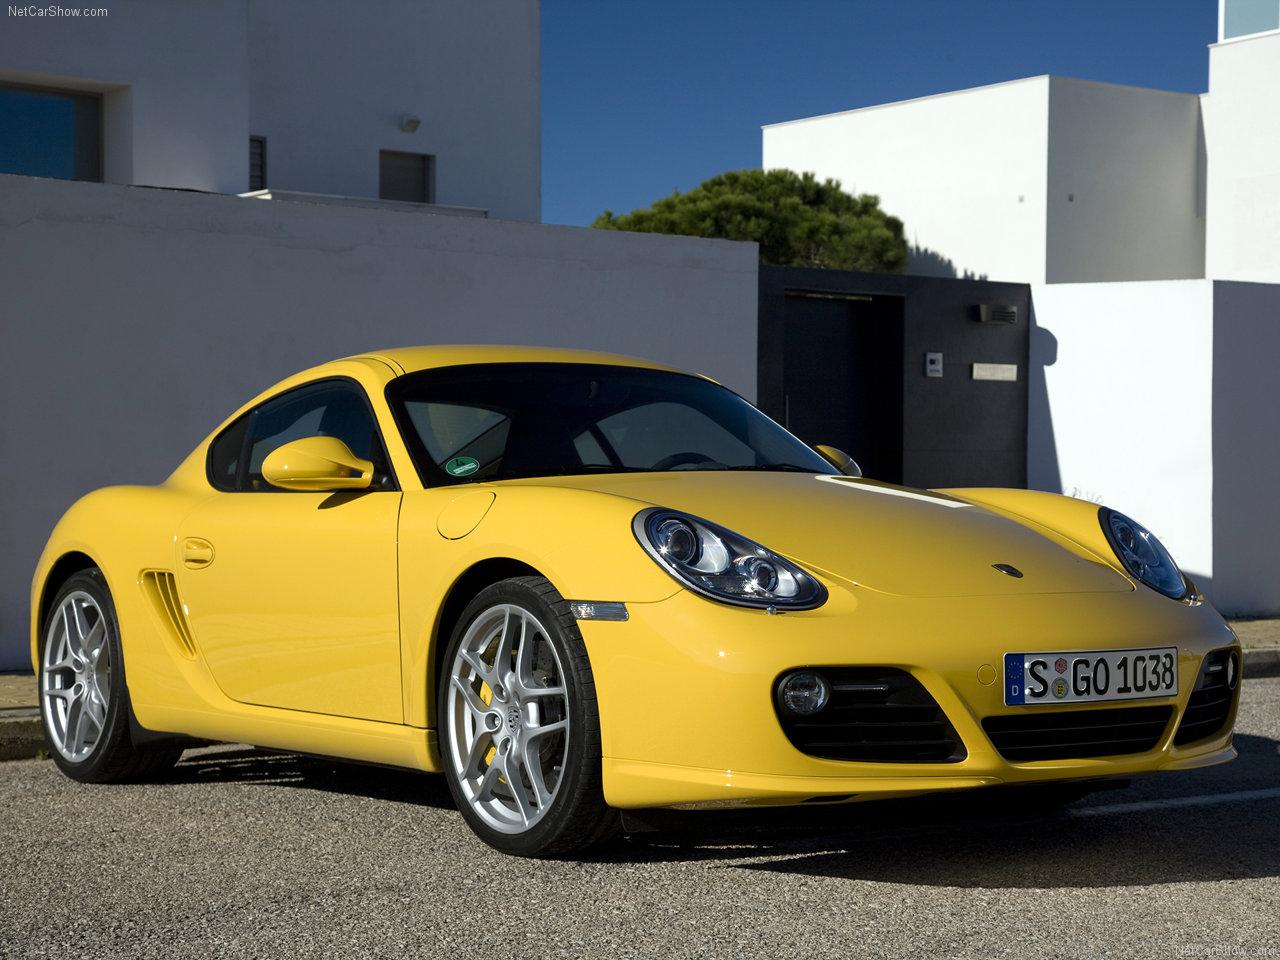 http://1.bp.blogspot.com/-K5Y5sEyYmI0/TYlt7hlHIBI/AAAAAAAACjY/otmQB66VEDY/s1600/Porsche-Cayman_S_2009_1280x960_wallpaper_05.jpg